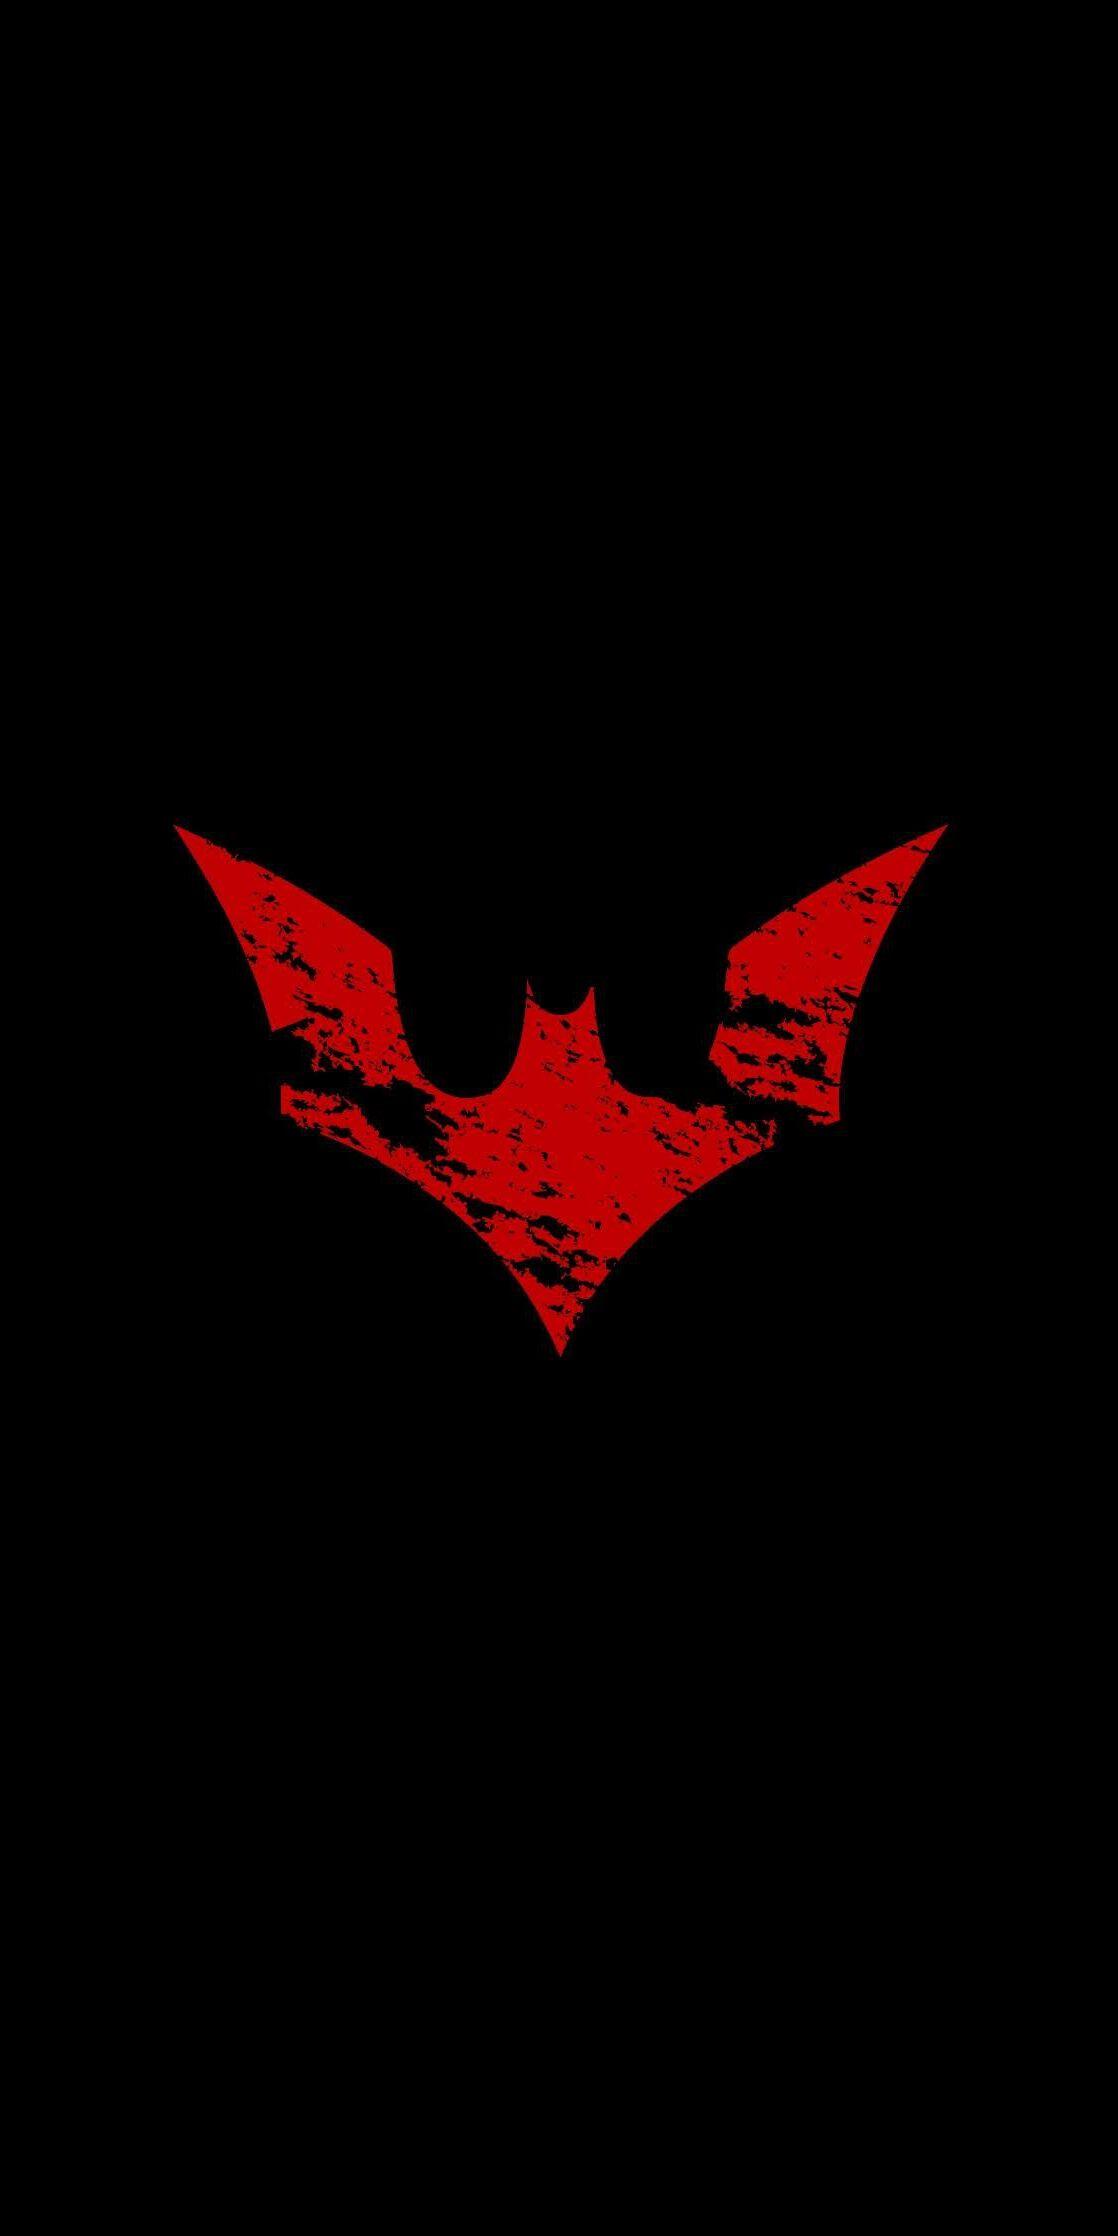 Batman Beyond Wallpaper Android